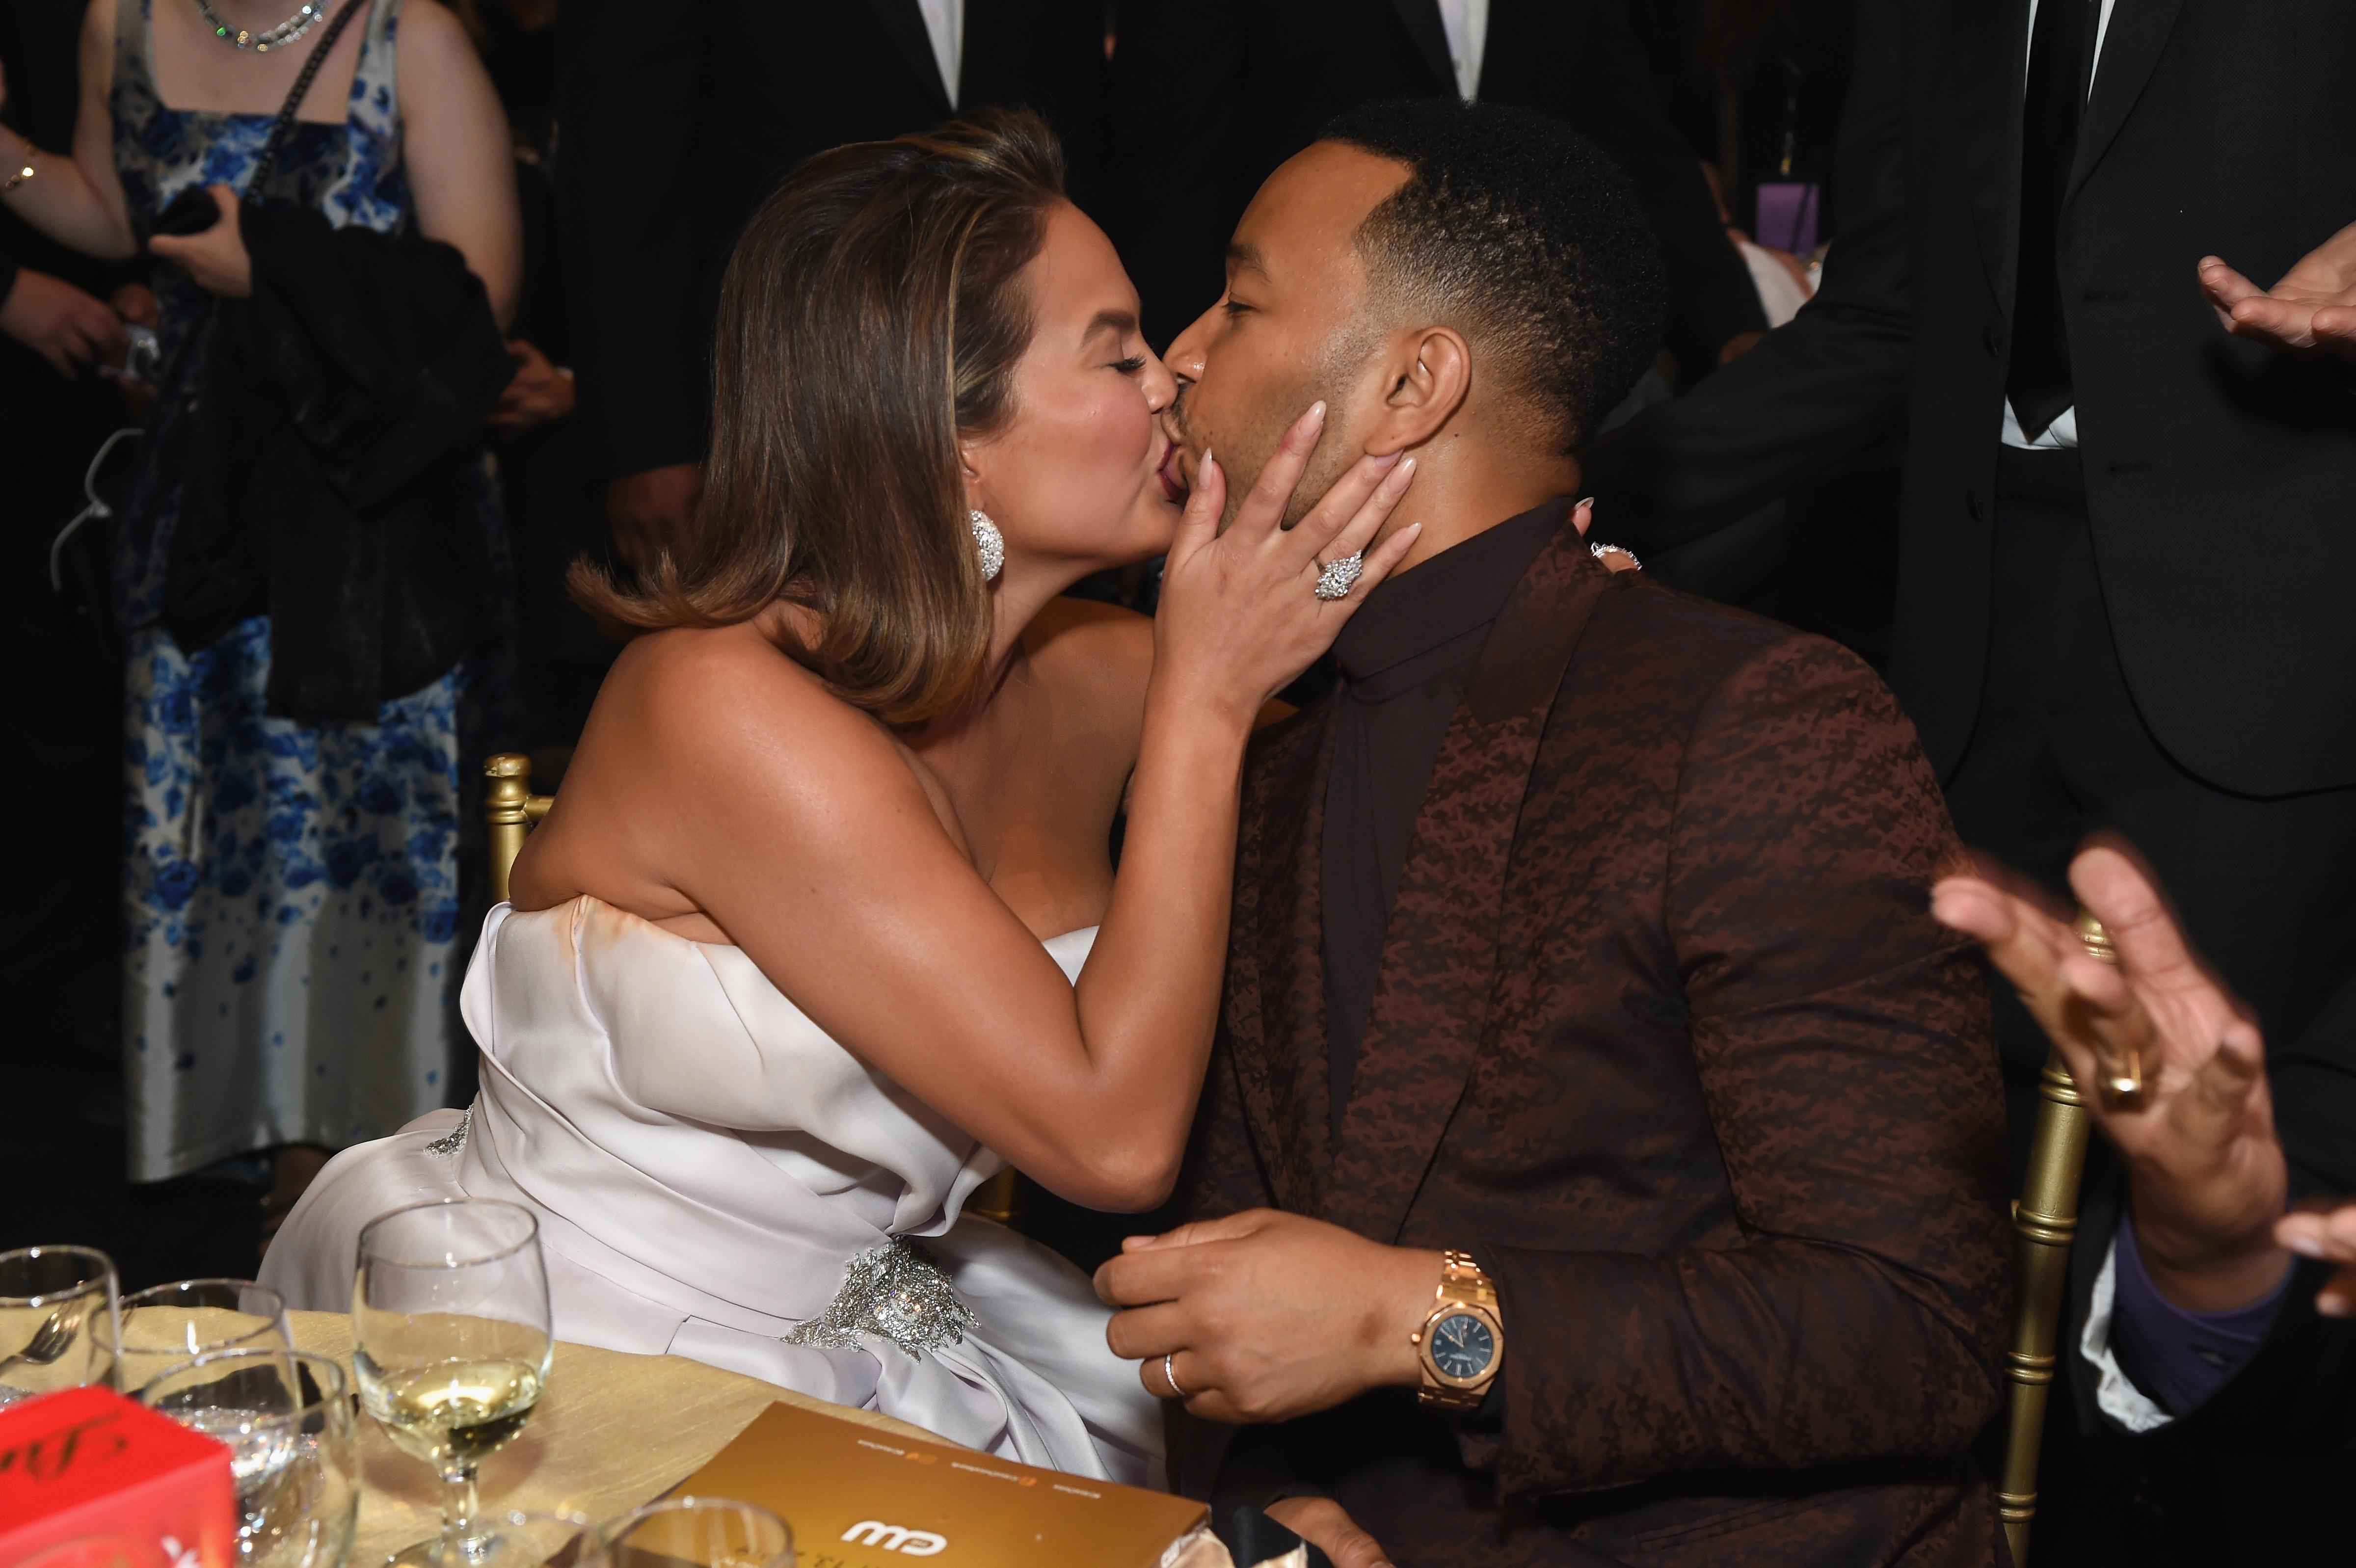 Chrissy Teigen and John Legend attend the 24th Annual Critics' Choice Awards at Barker Hangar in Santa Monica, California, on Jan. 13, 2019.